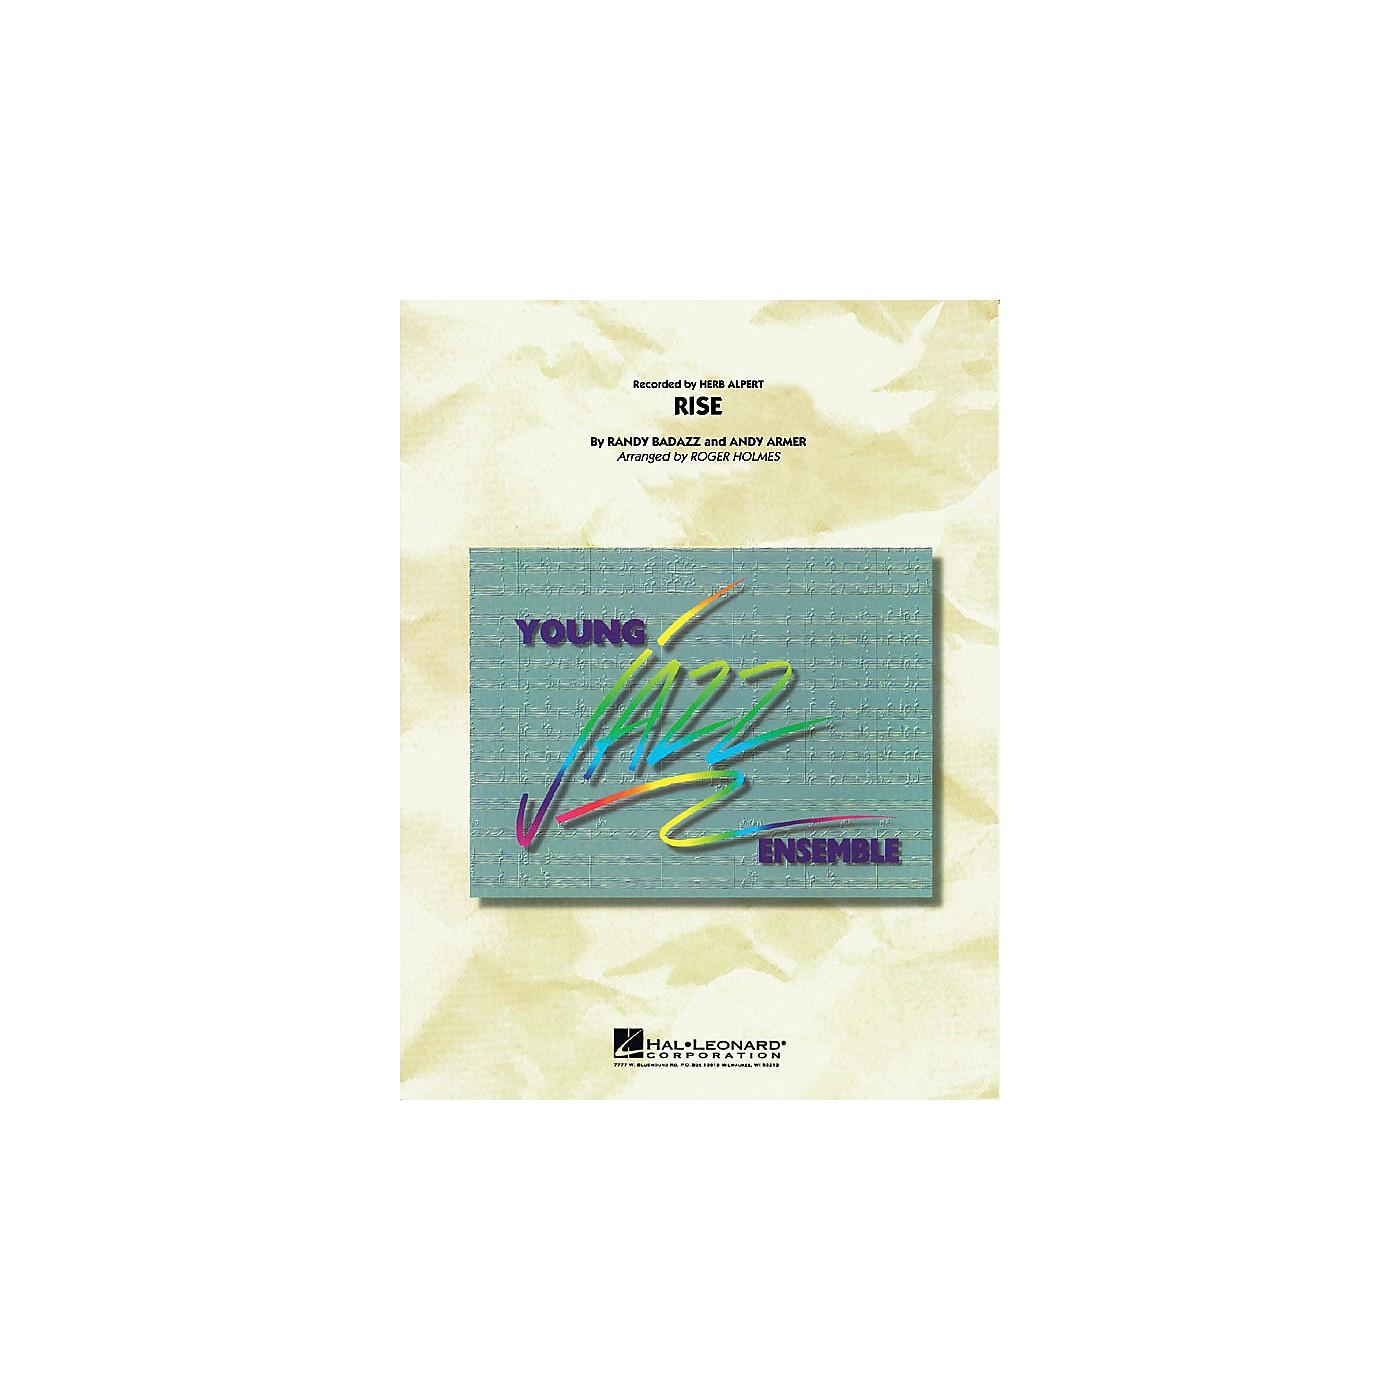 Hal Leonard Rise Jazz Band Level 3 by Herb Alpert Arranged by Roger Holmes thumbnail